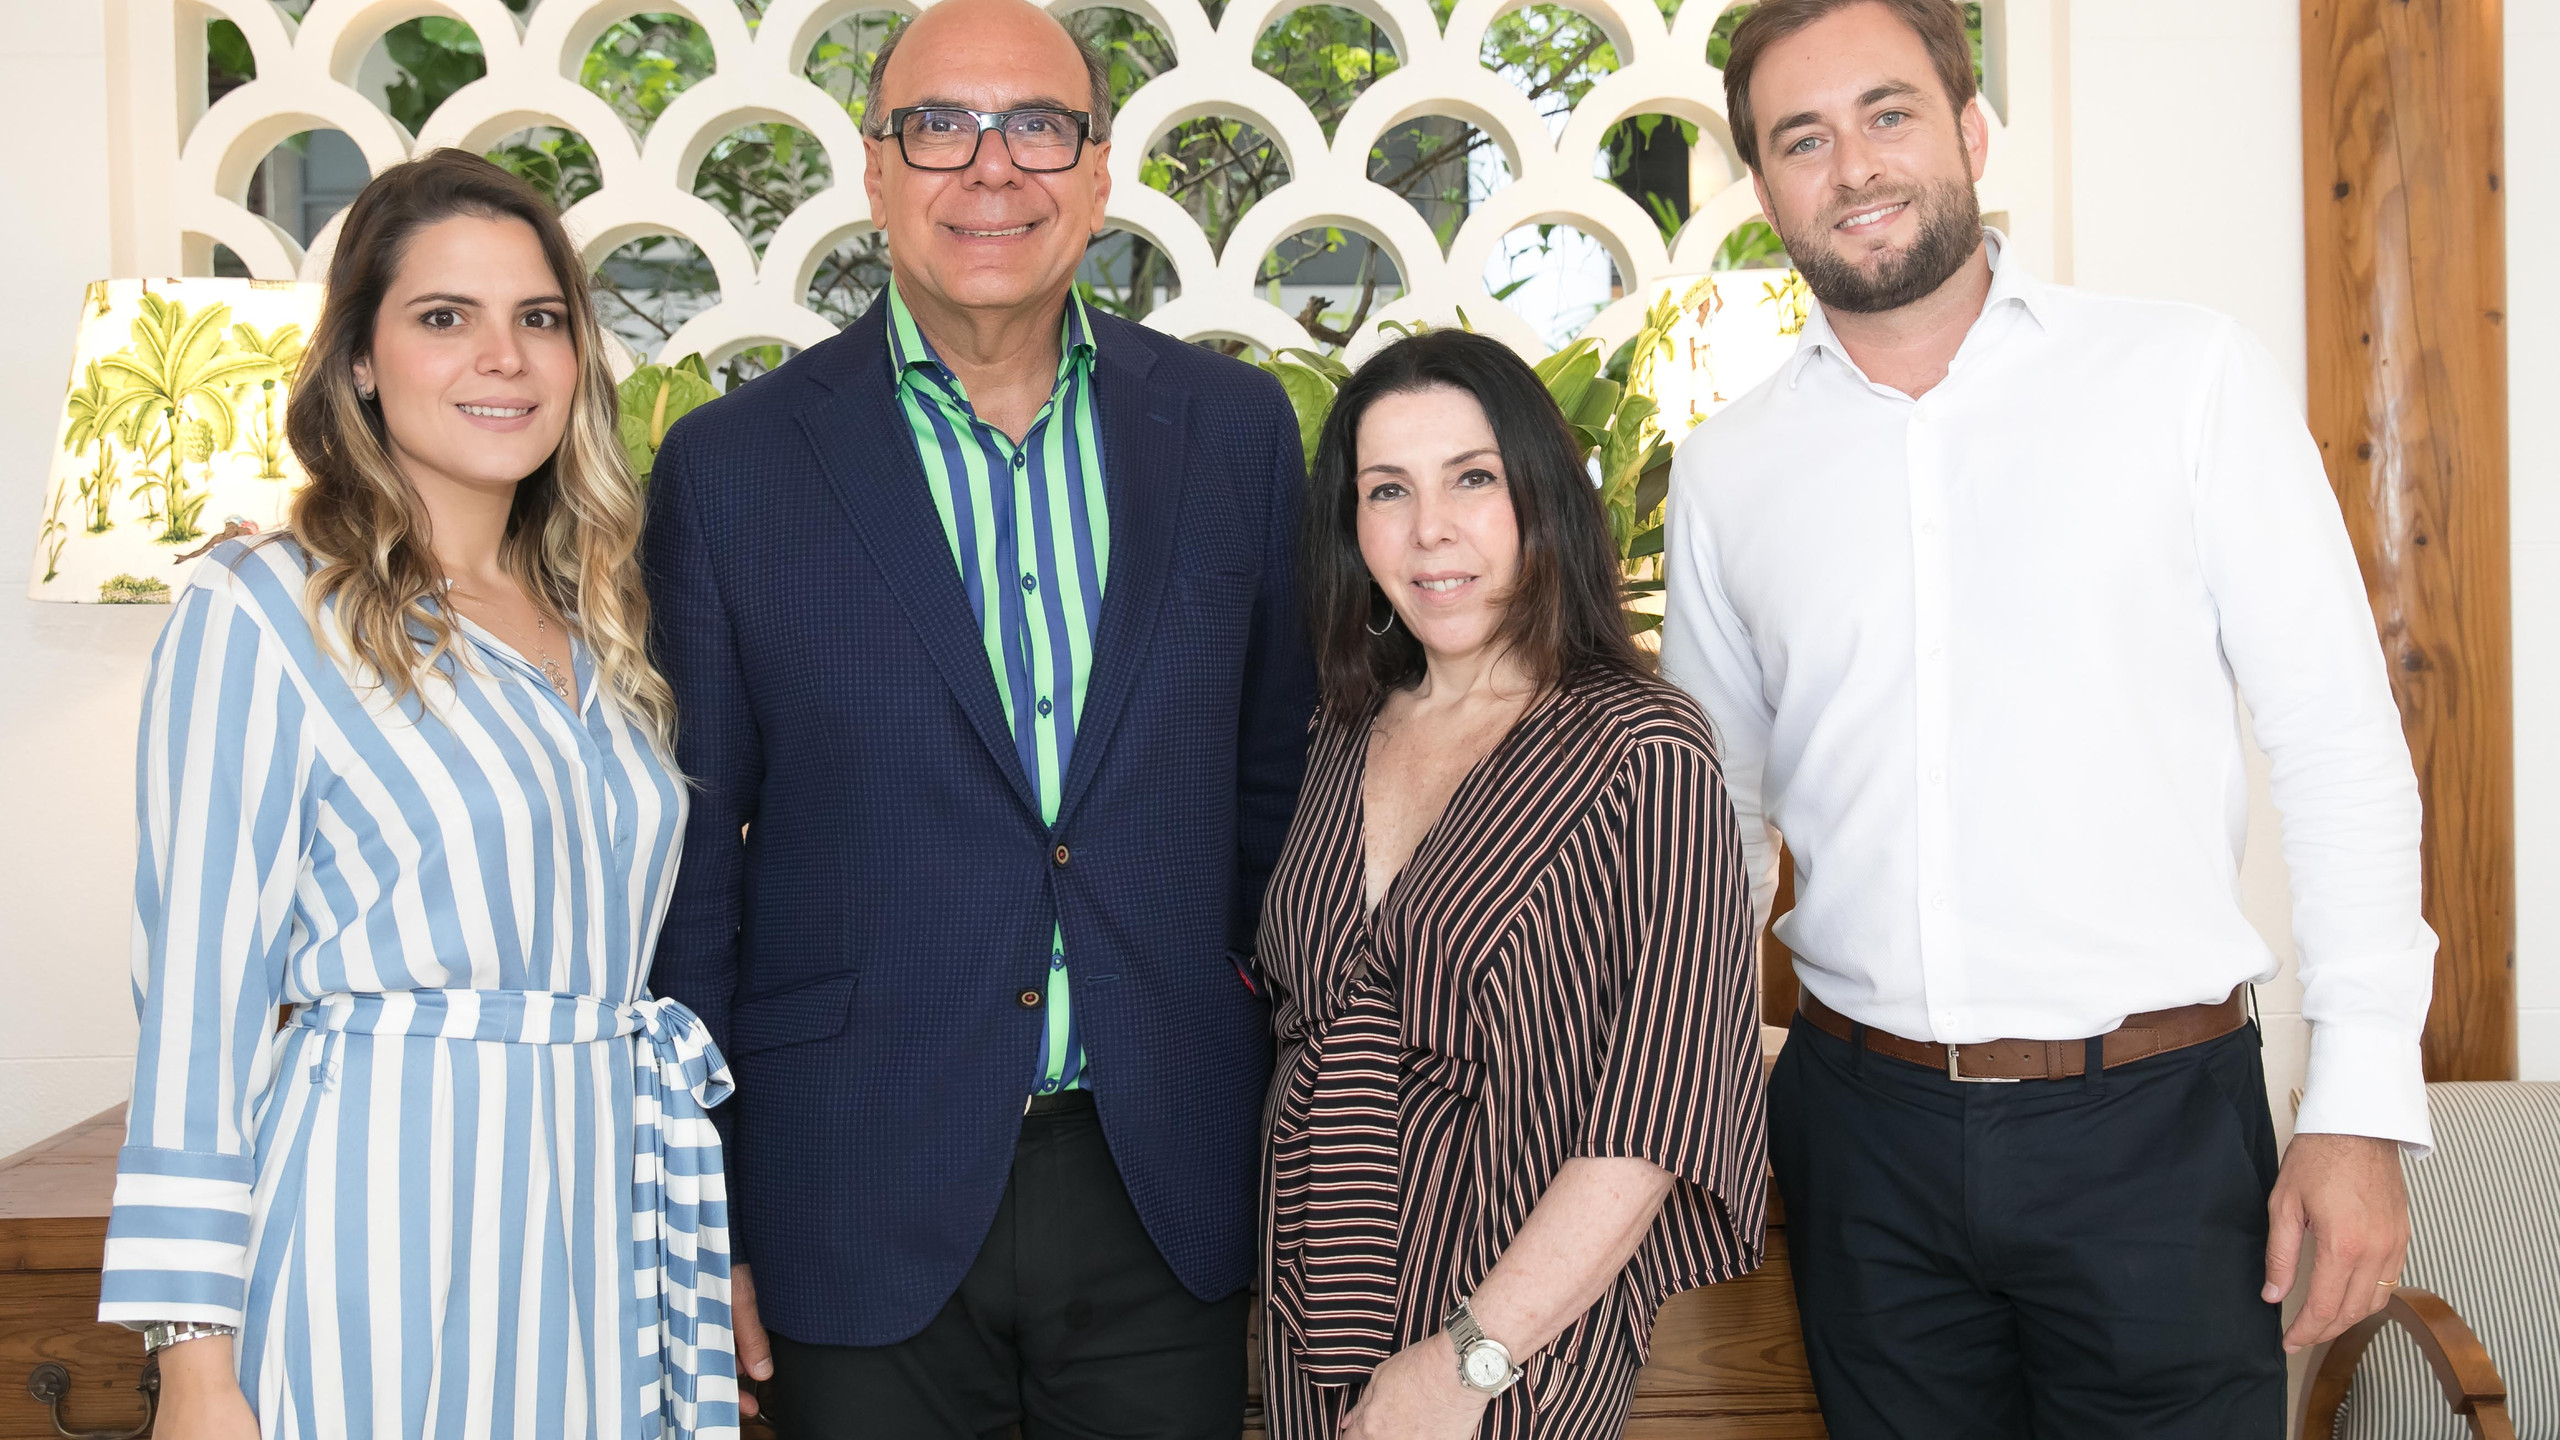 _Paloma e Arnaldo Danemberg e Paola Ribeiro e Cassiano Vitorino_5670